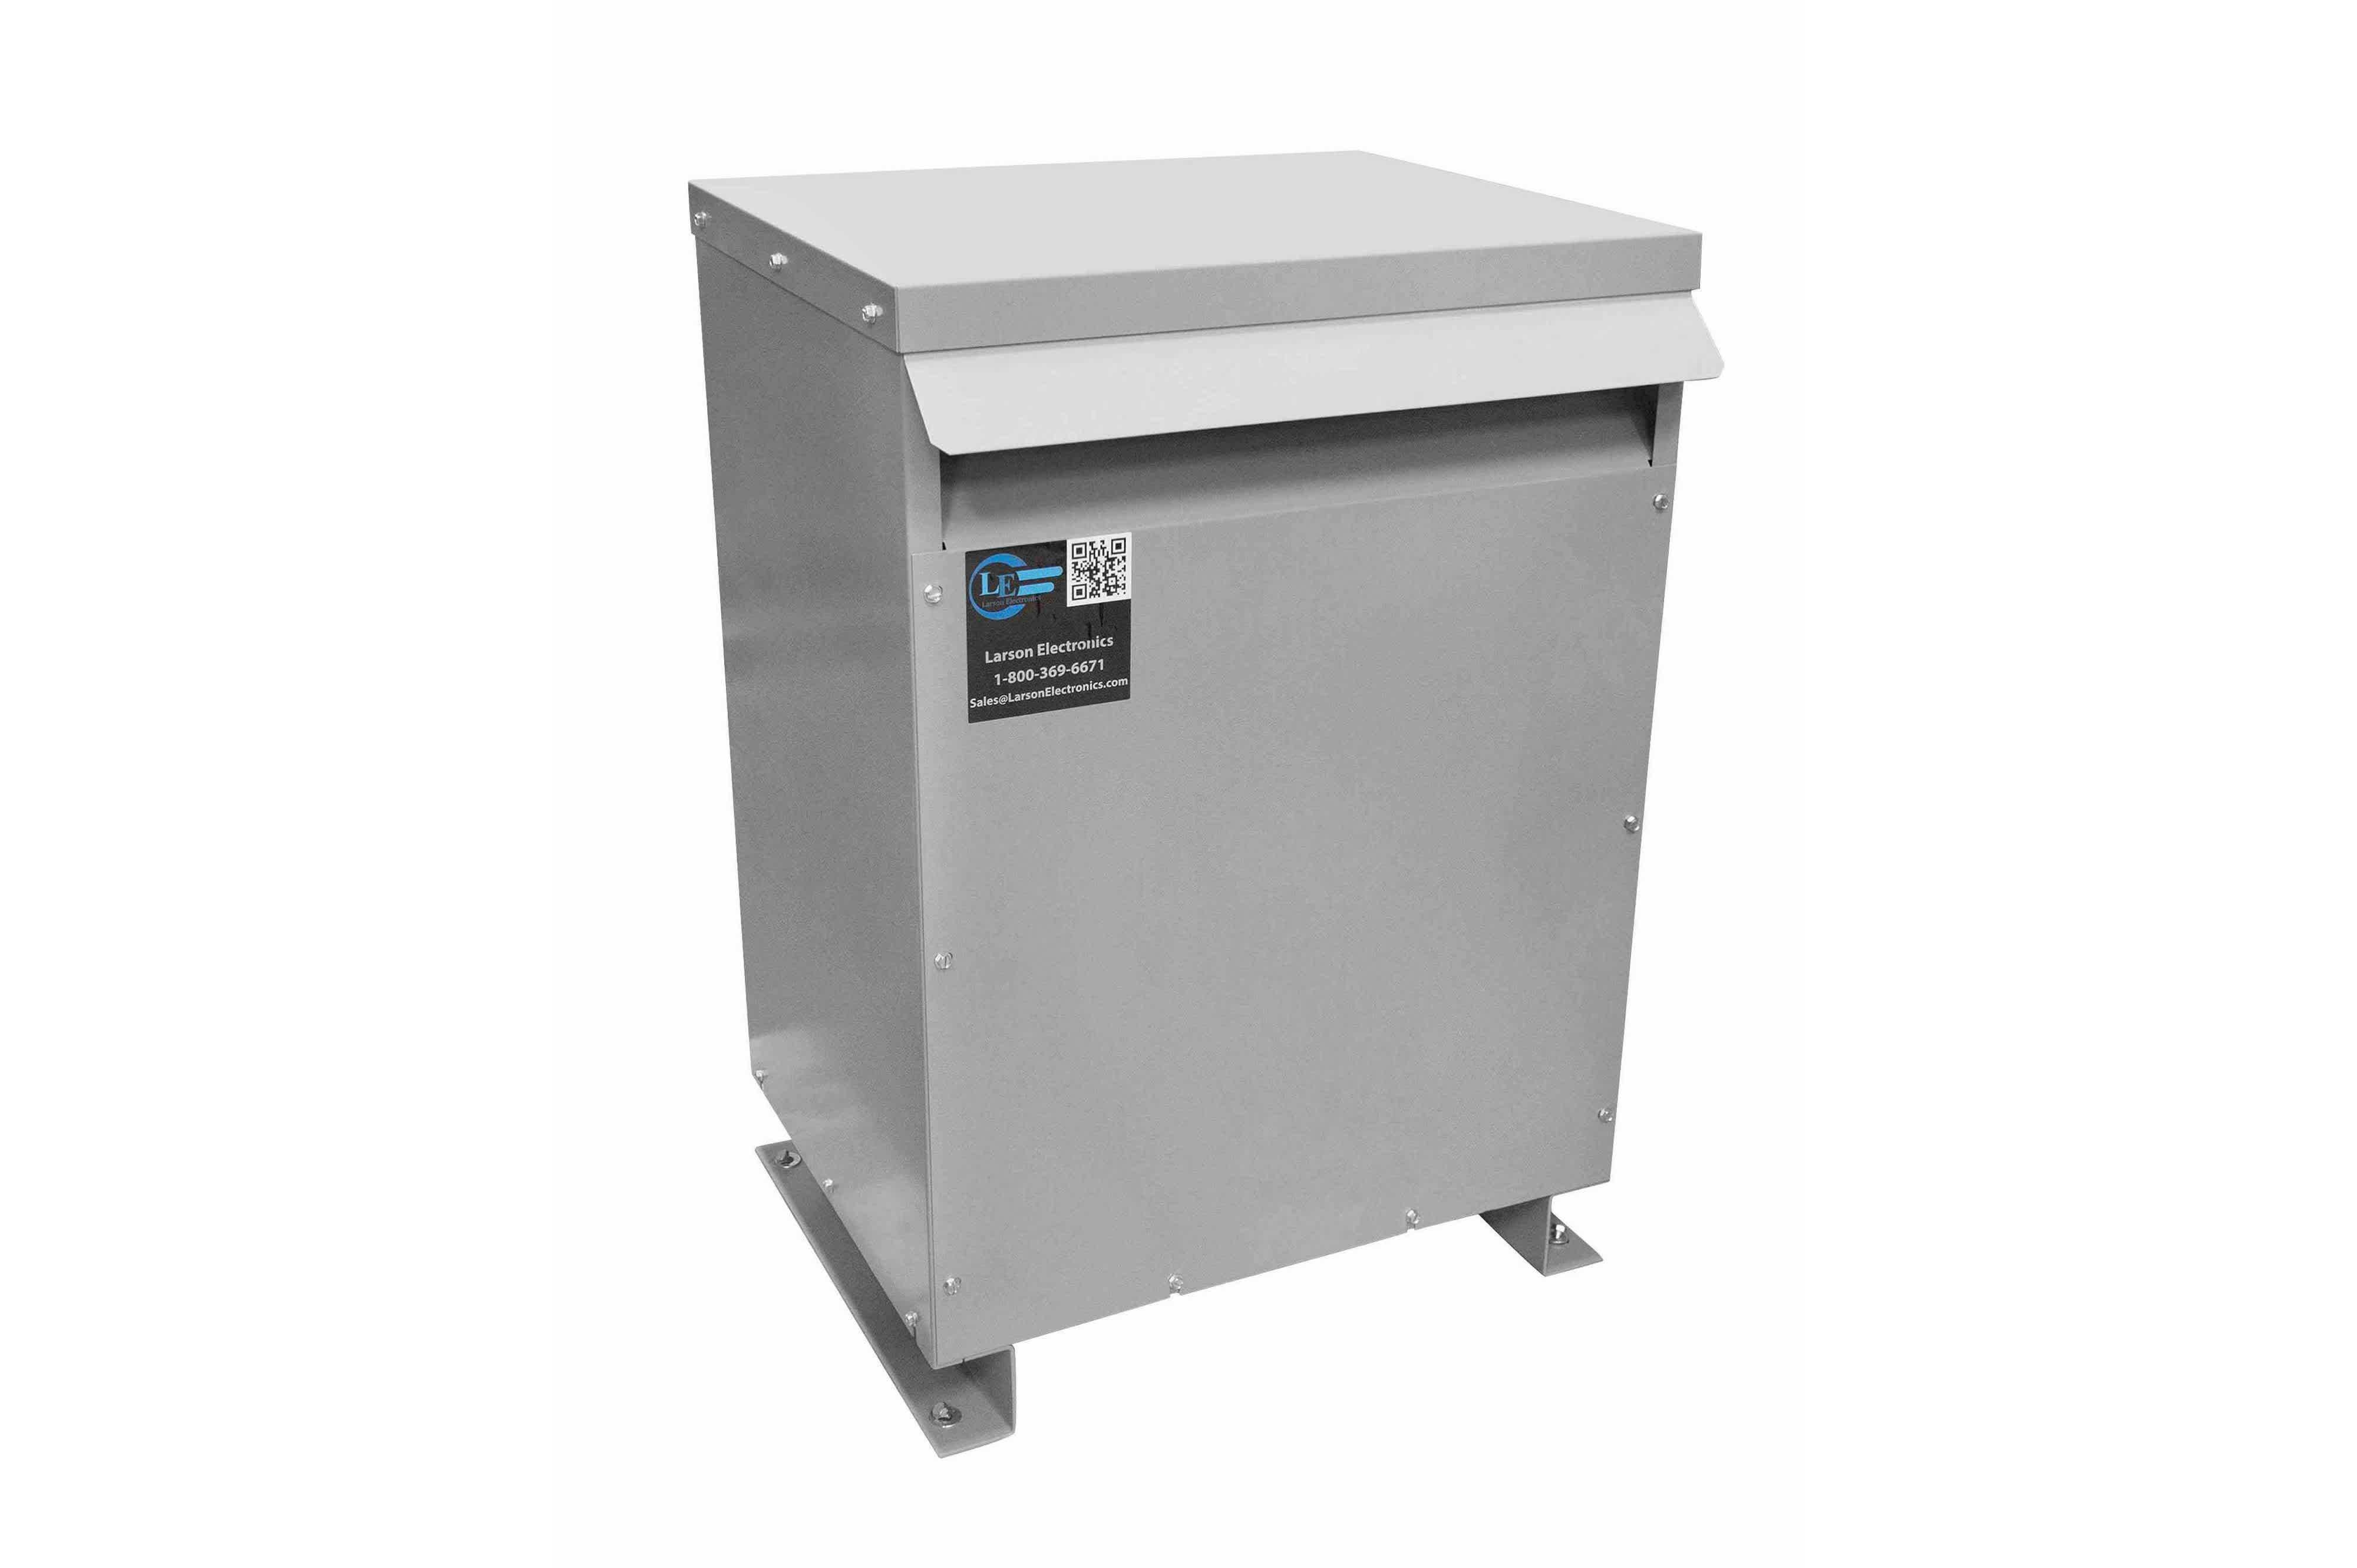 500 kVA 3PH Isolation Transformer, 460V Wye Primary, 575Y/332 Wye-N Secondary, N3R, Ventilated, 60 Hz